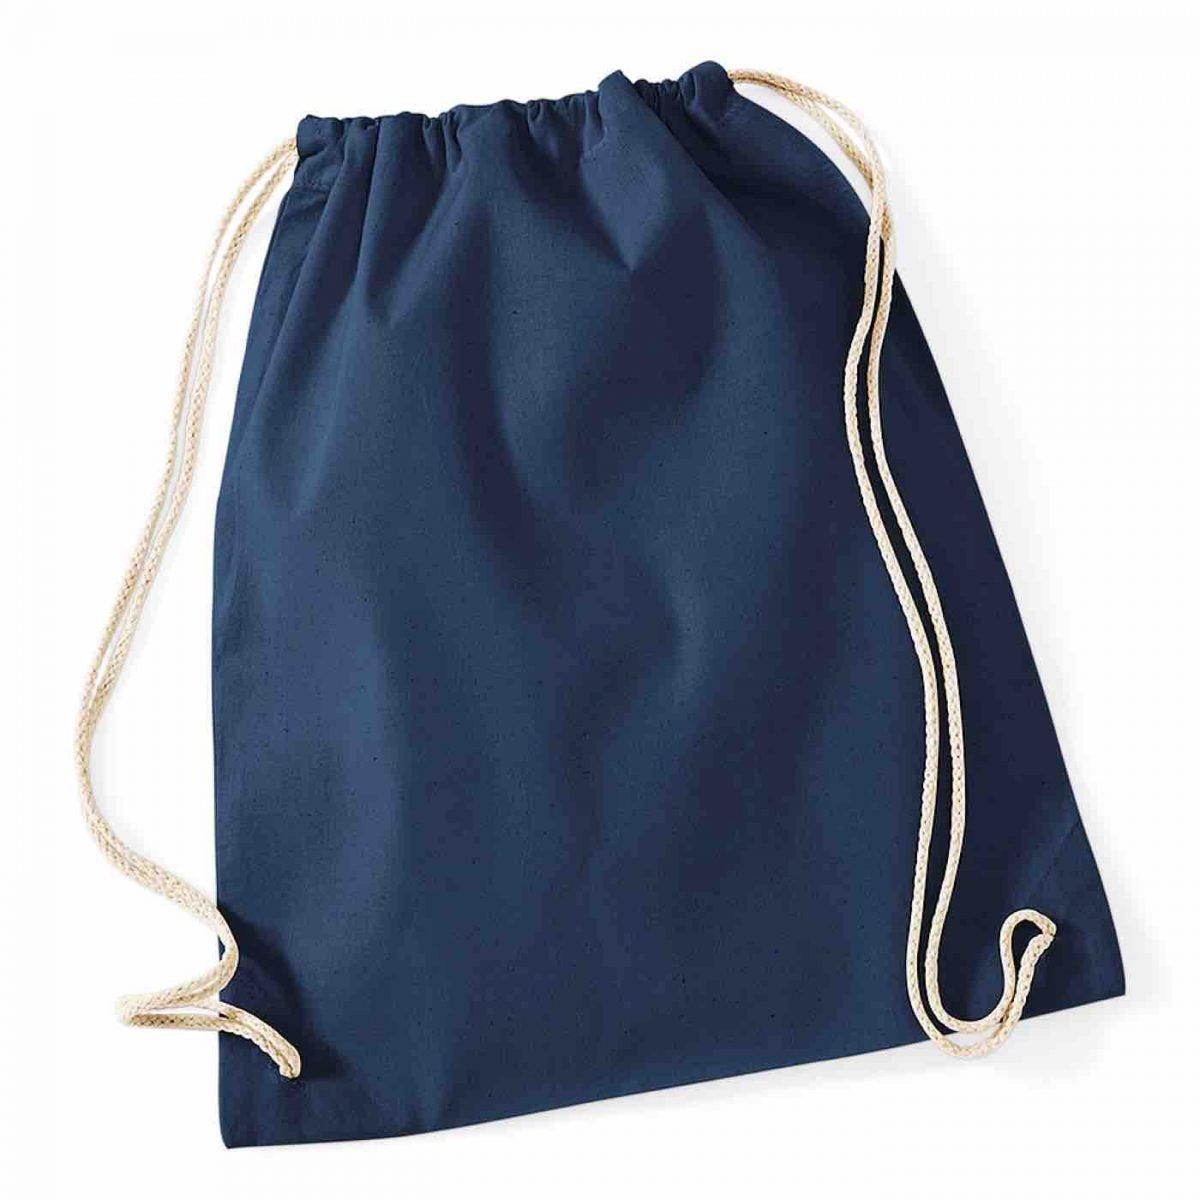 Navy Cotton Tote Bag